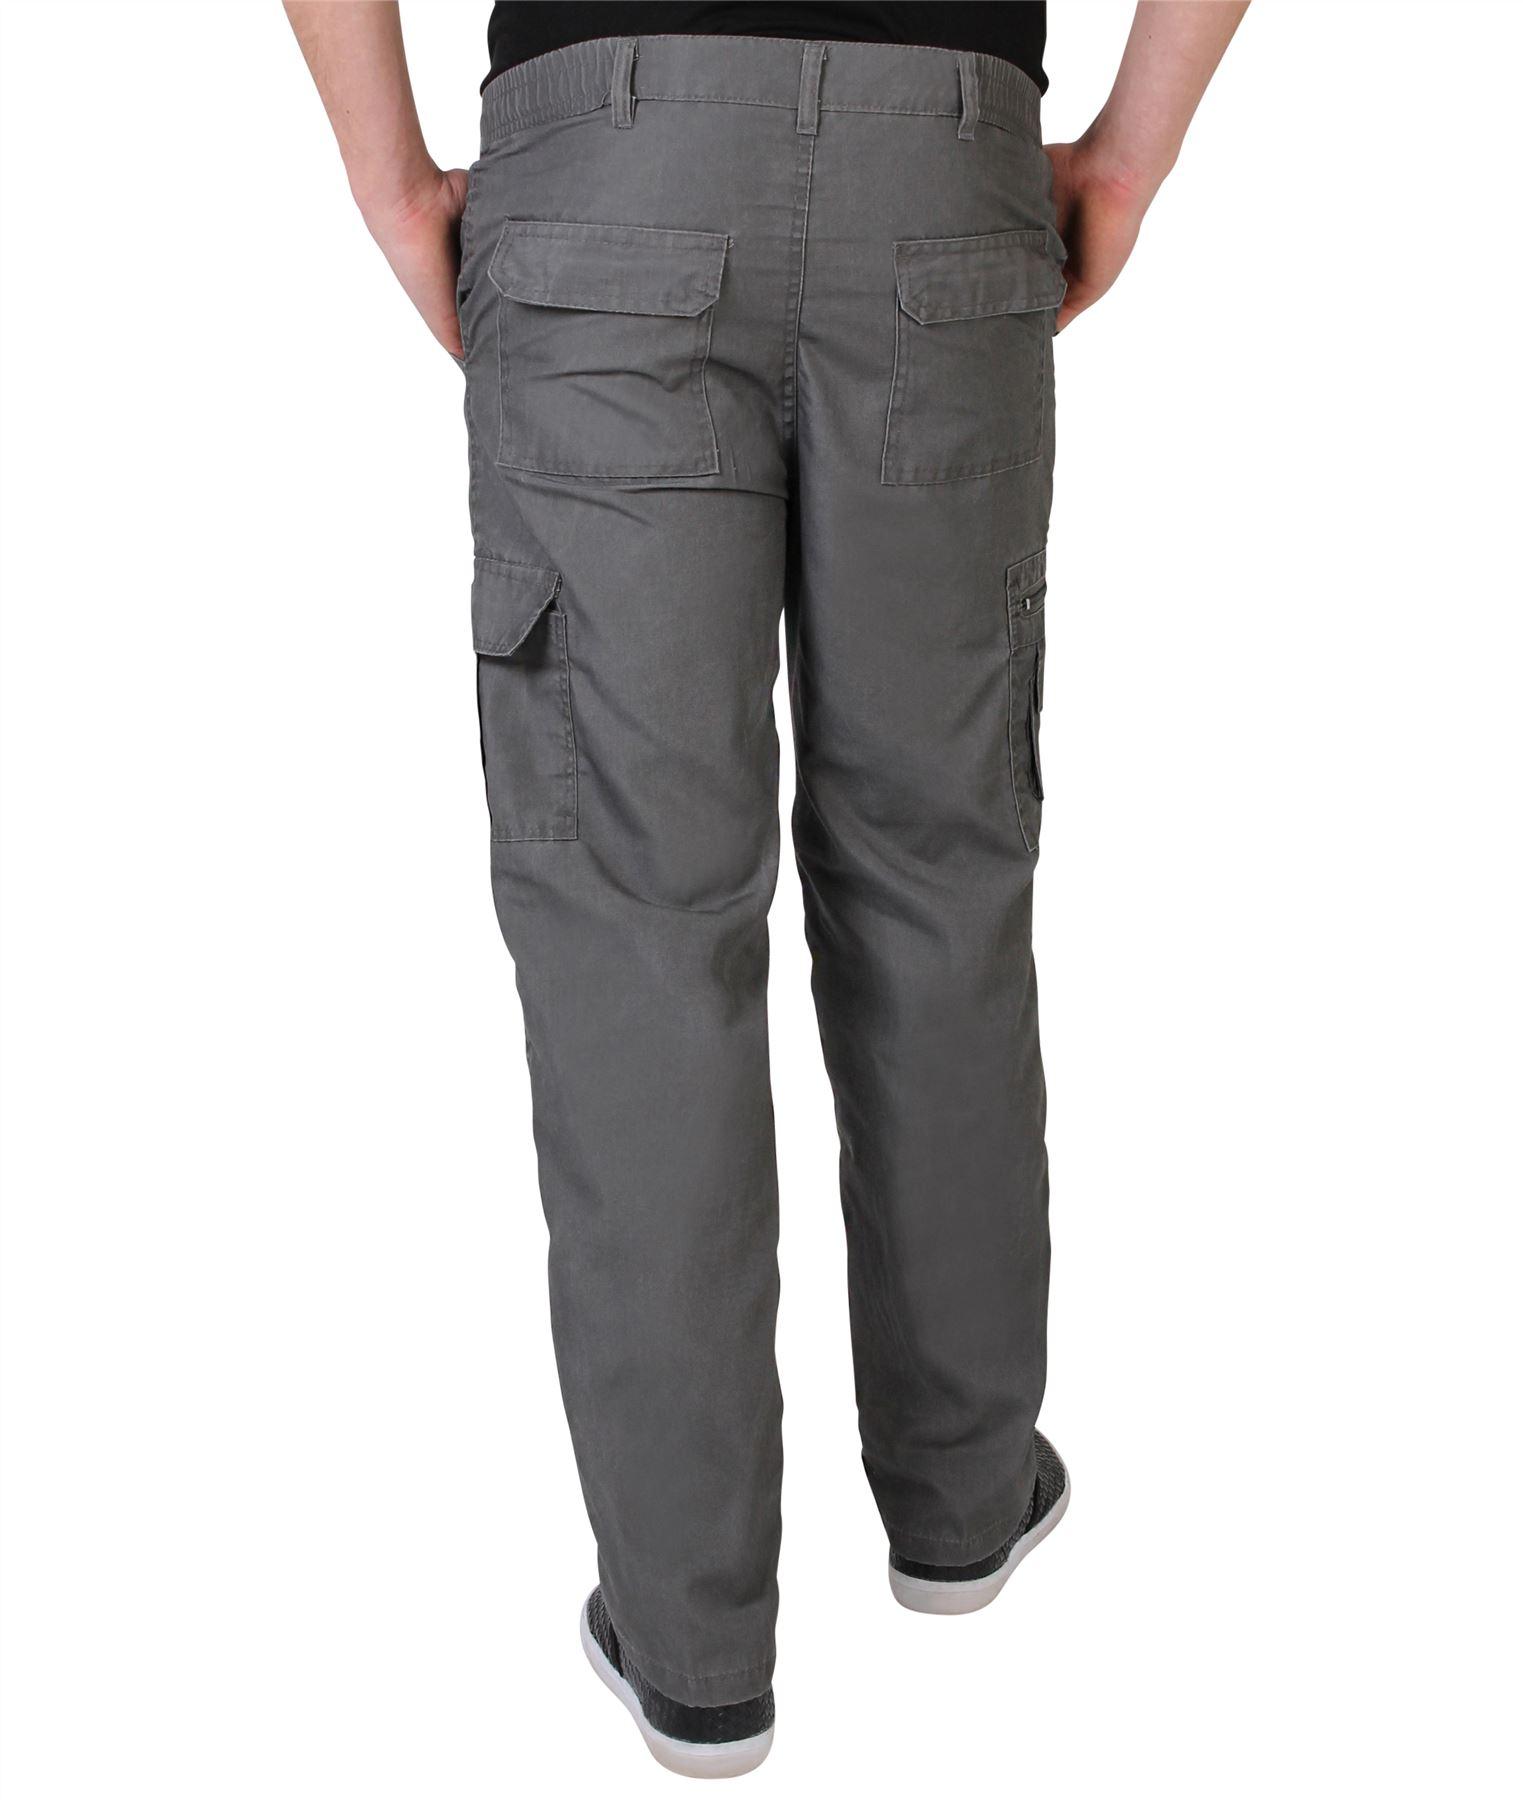 Pantalones-Hombre-Estilo-Cargo-Militar-Combate-Multibolsillos-Casual miniatura 19